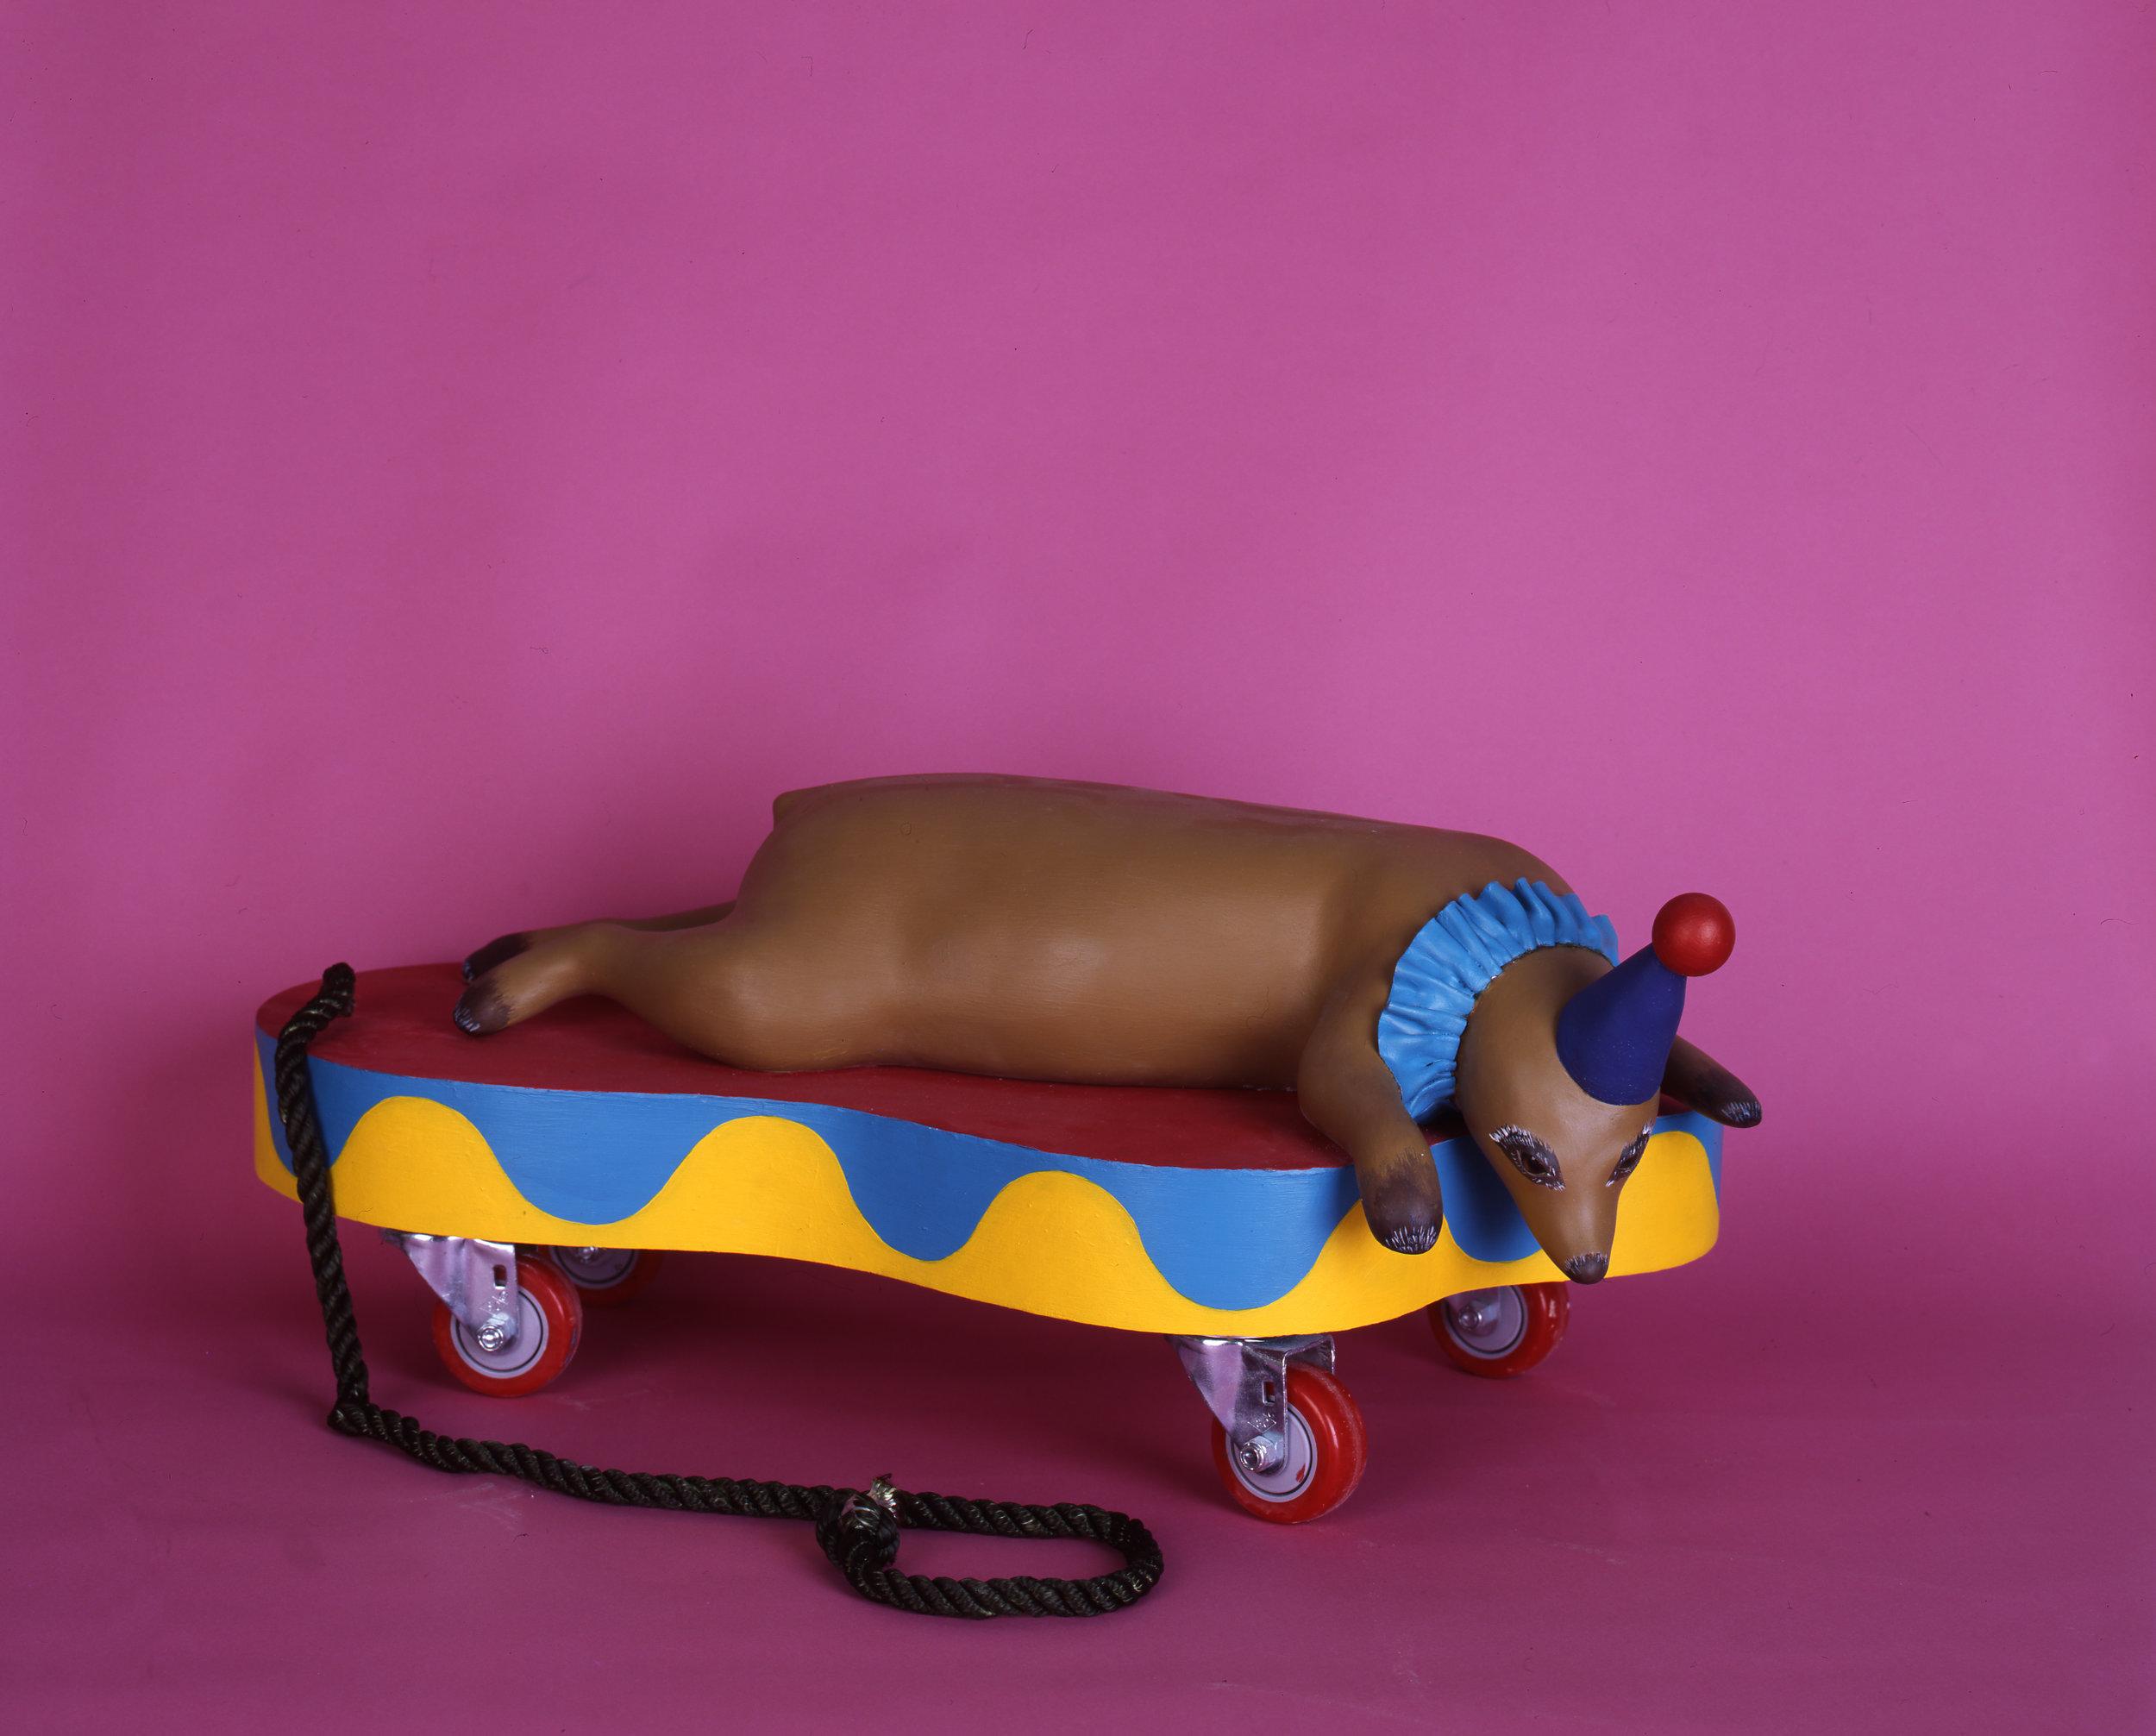 Little Guy, 2008 wood, foam, aqua resin, surfacing veil, plastic, acrylic paint, castor wheels and rope 35,5 x 76 x 40,5 cm - 14 1/32 x 30 x 15 inches